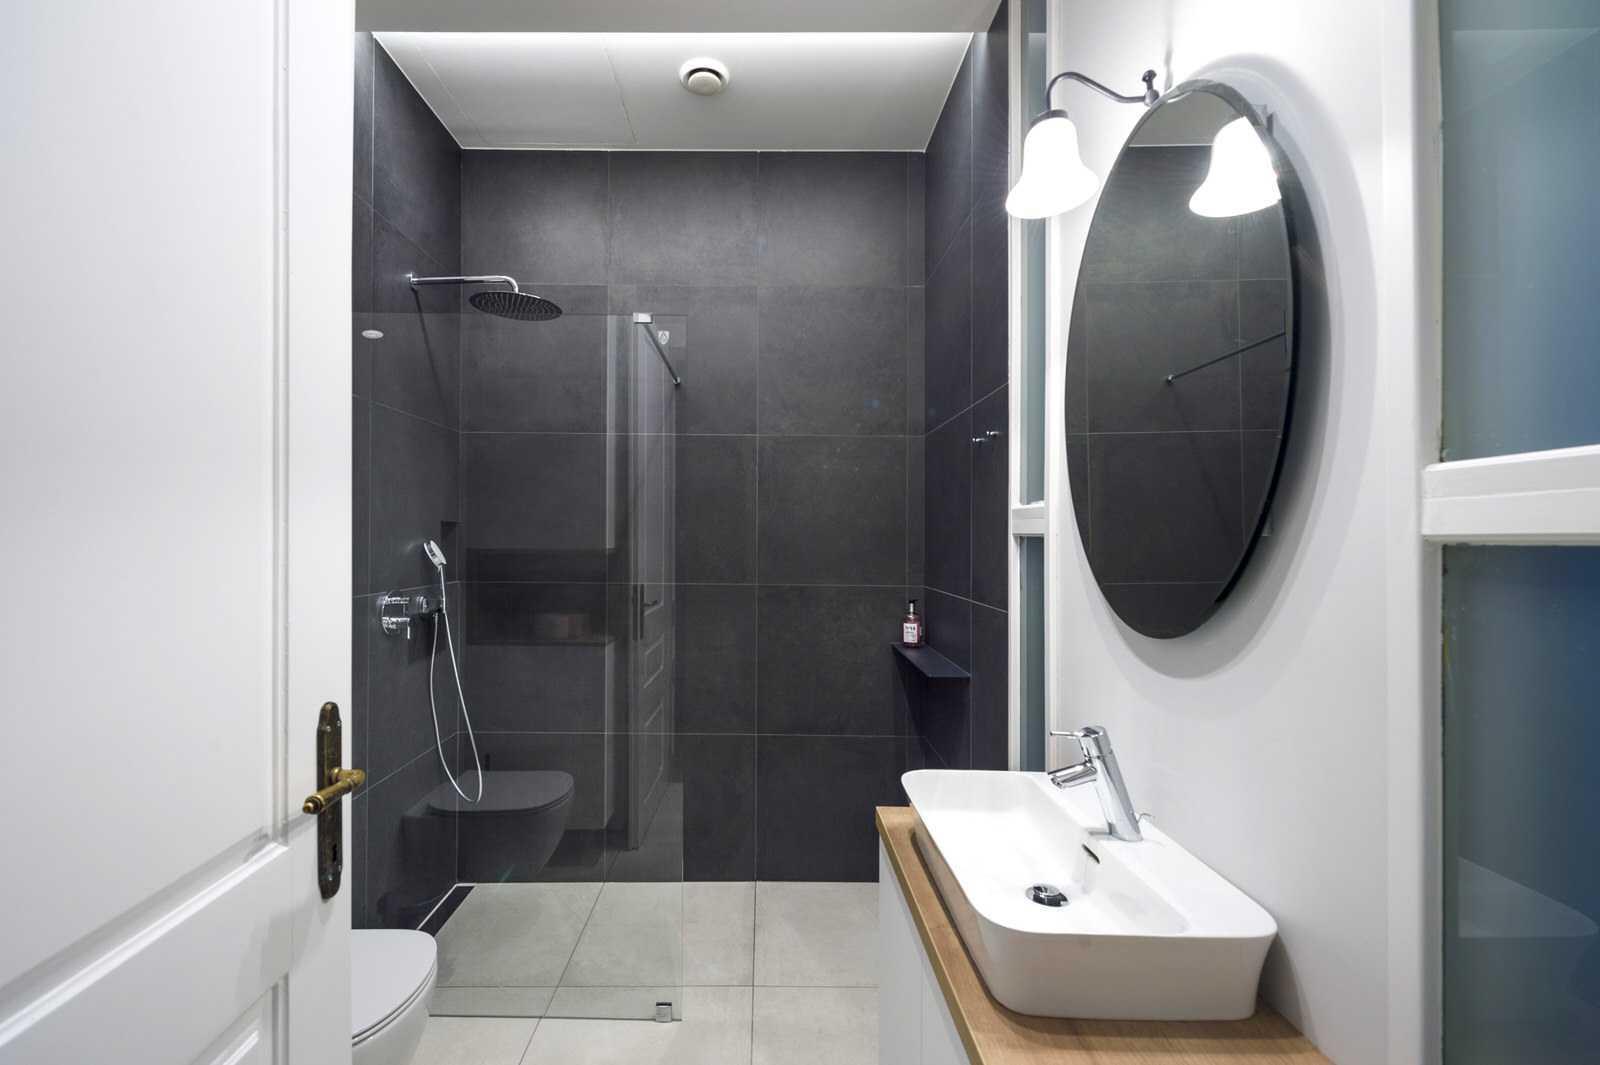 Ljubljana rental apartment bathroom, with stand-up glass shower